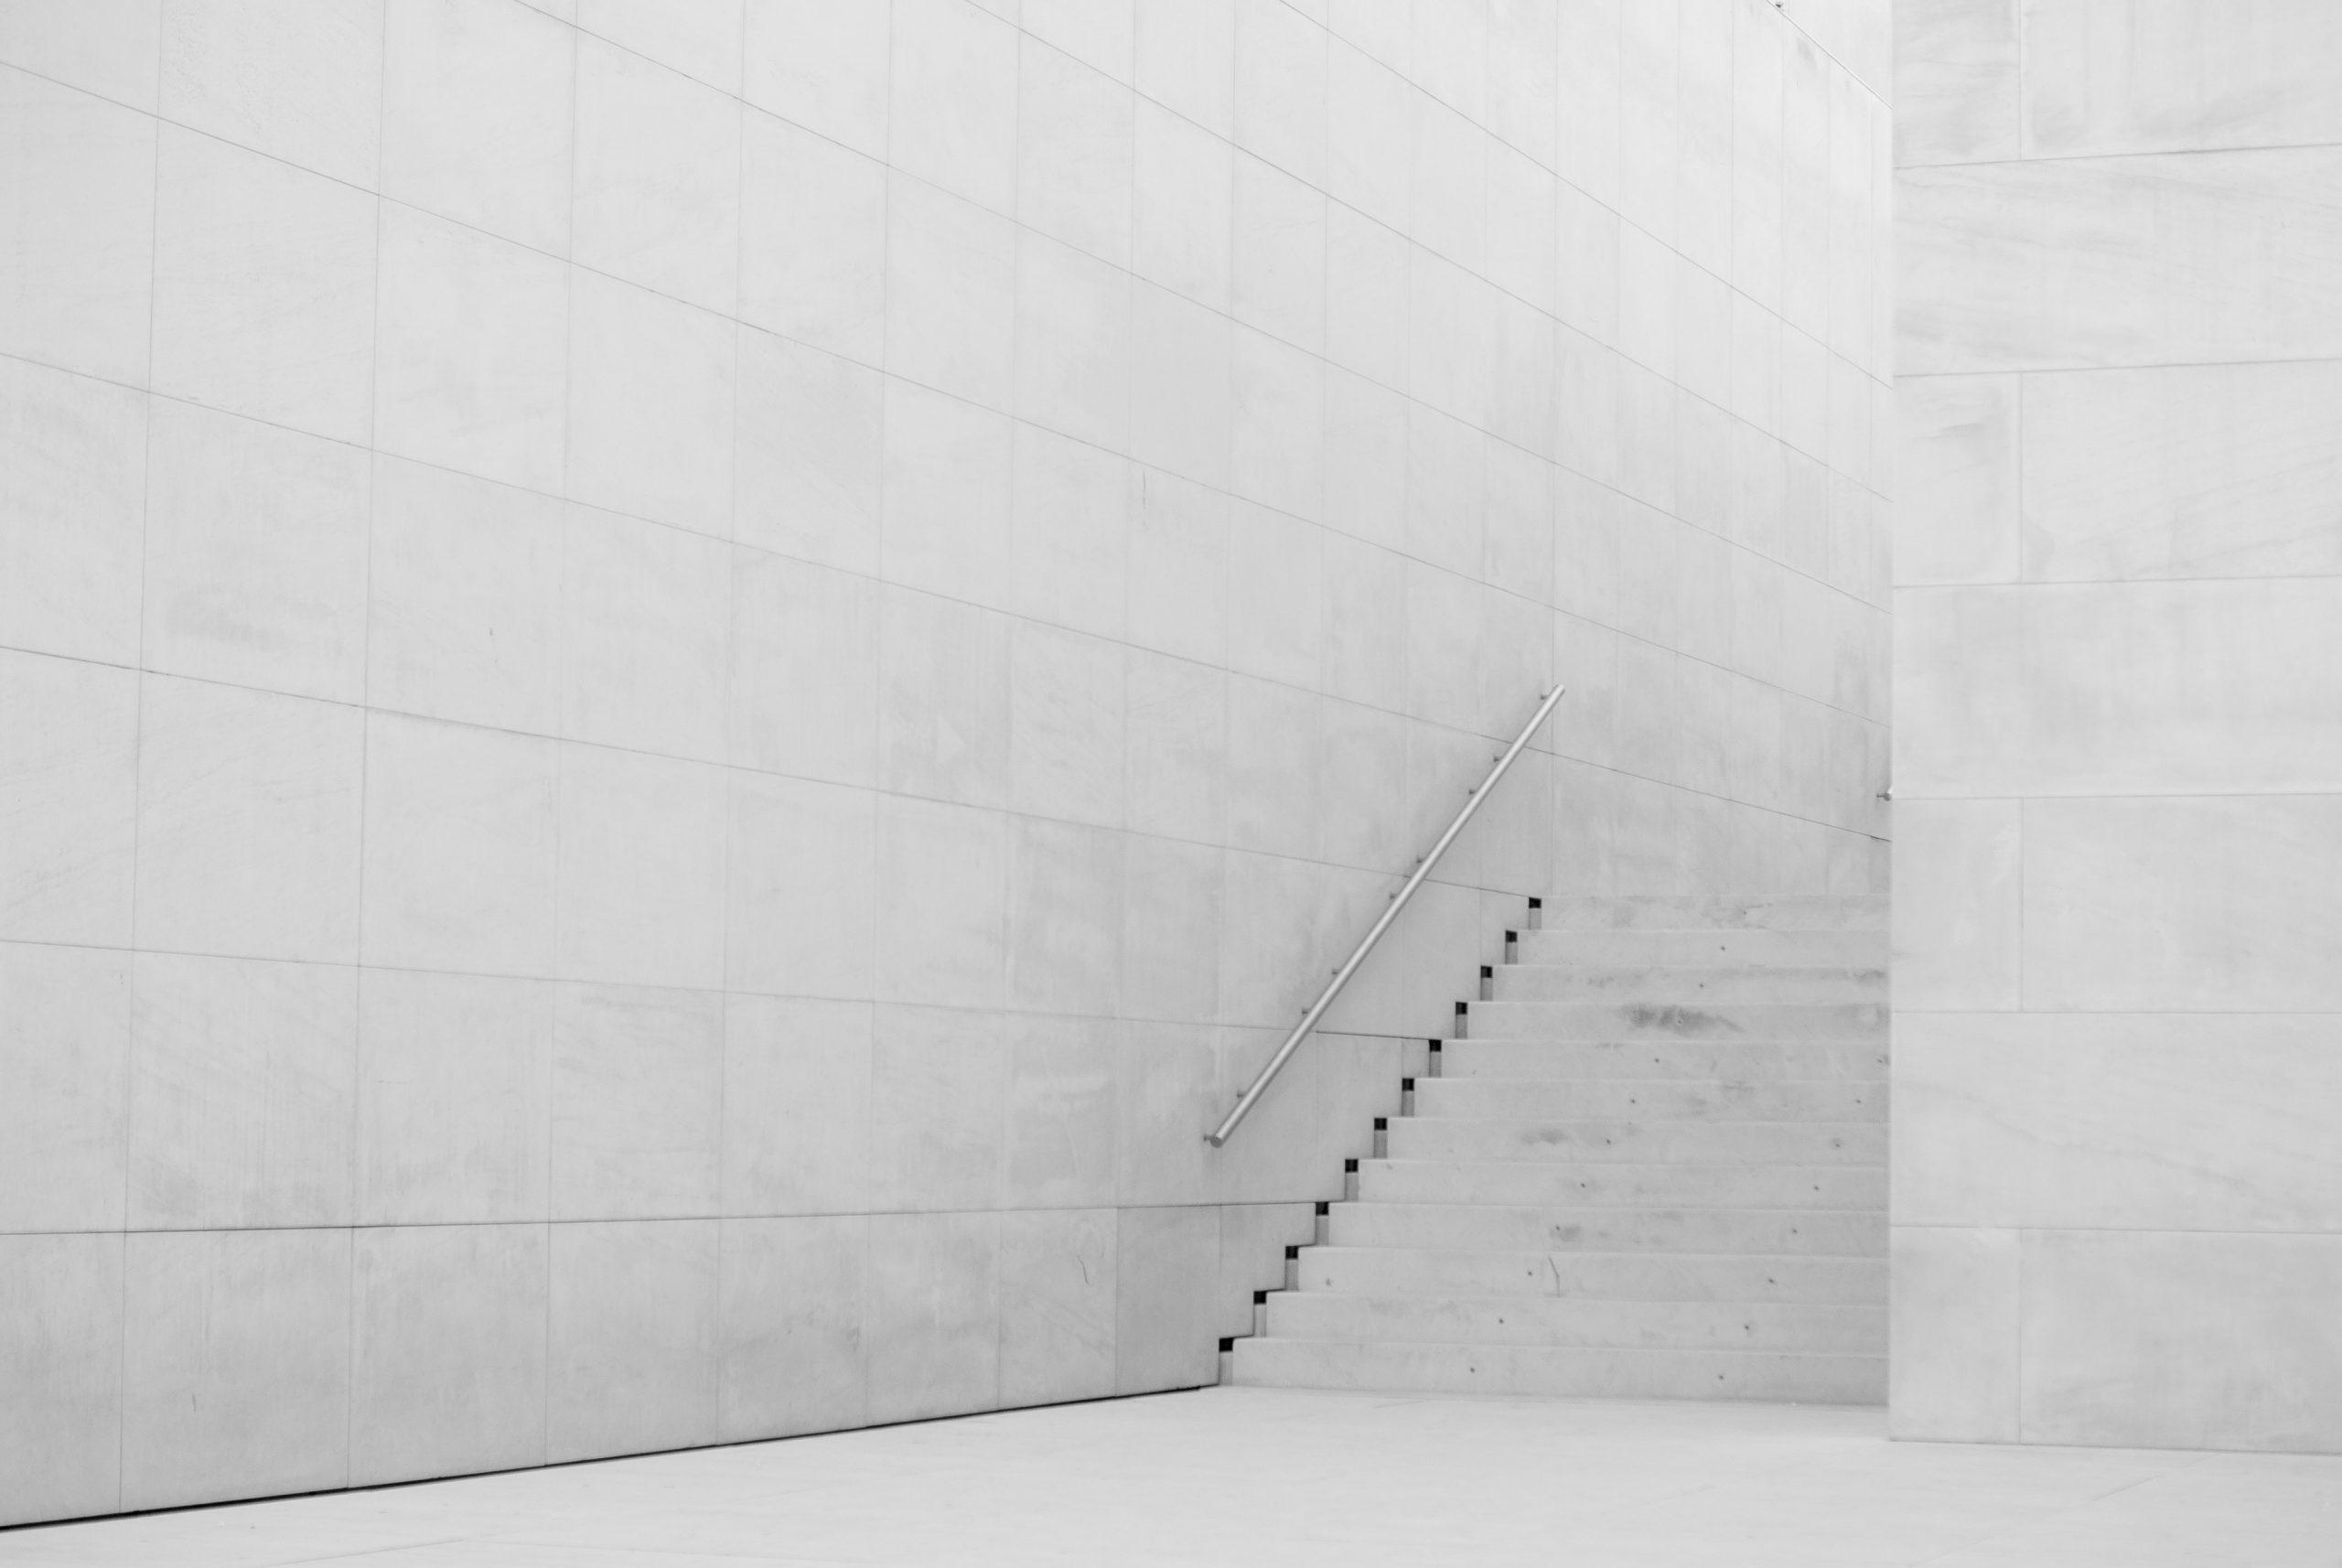 stairs-img1